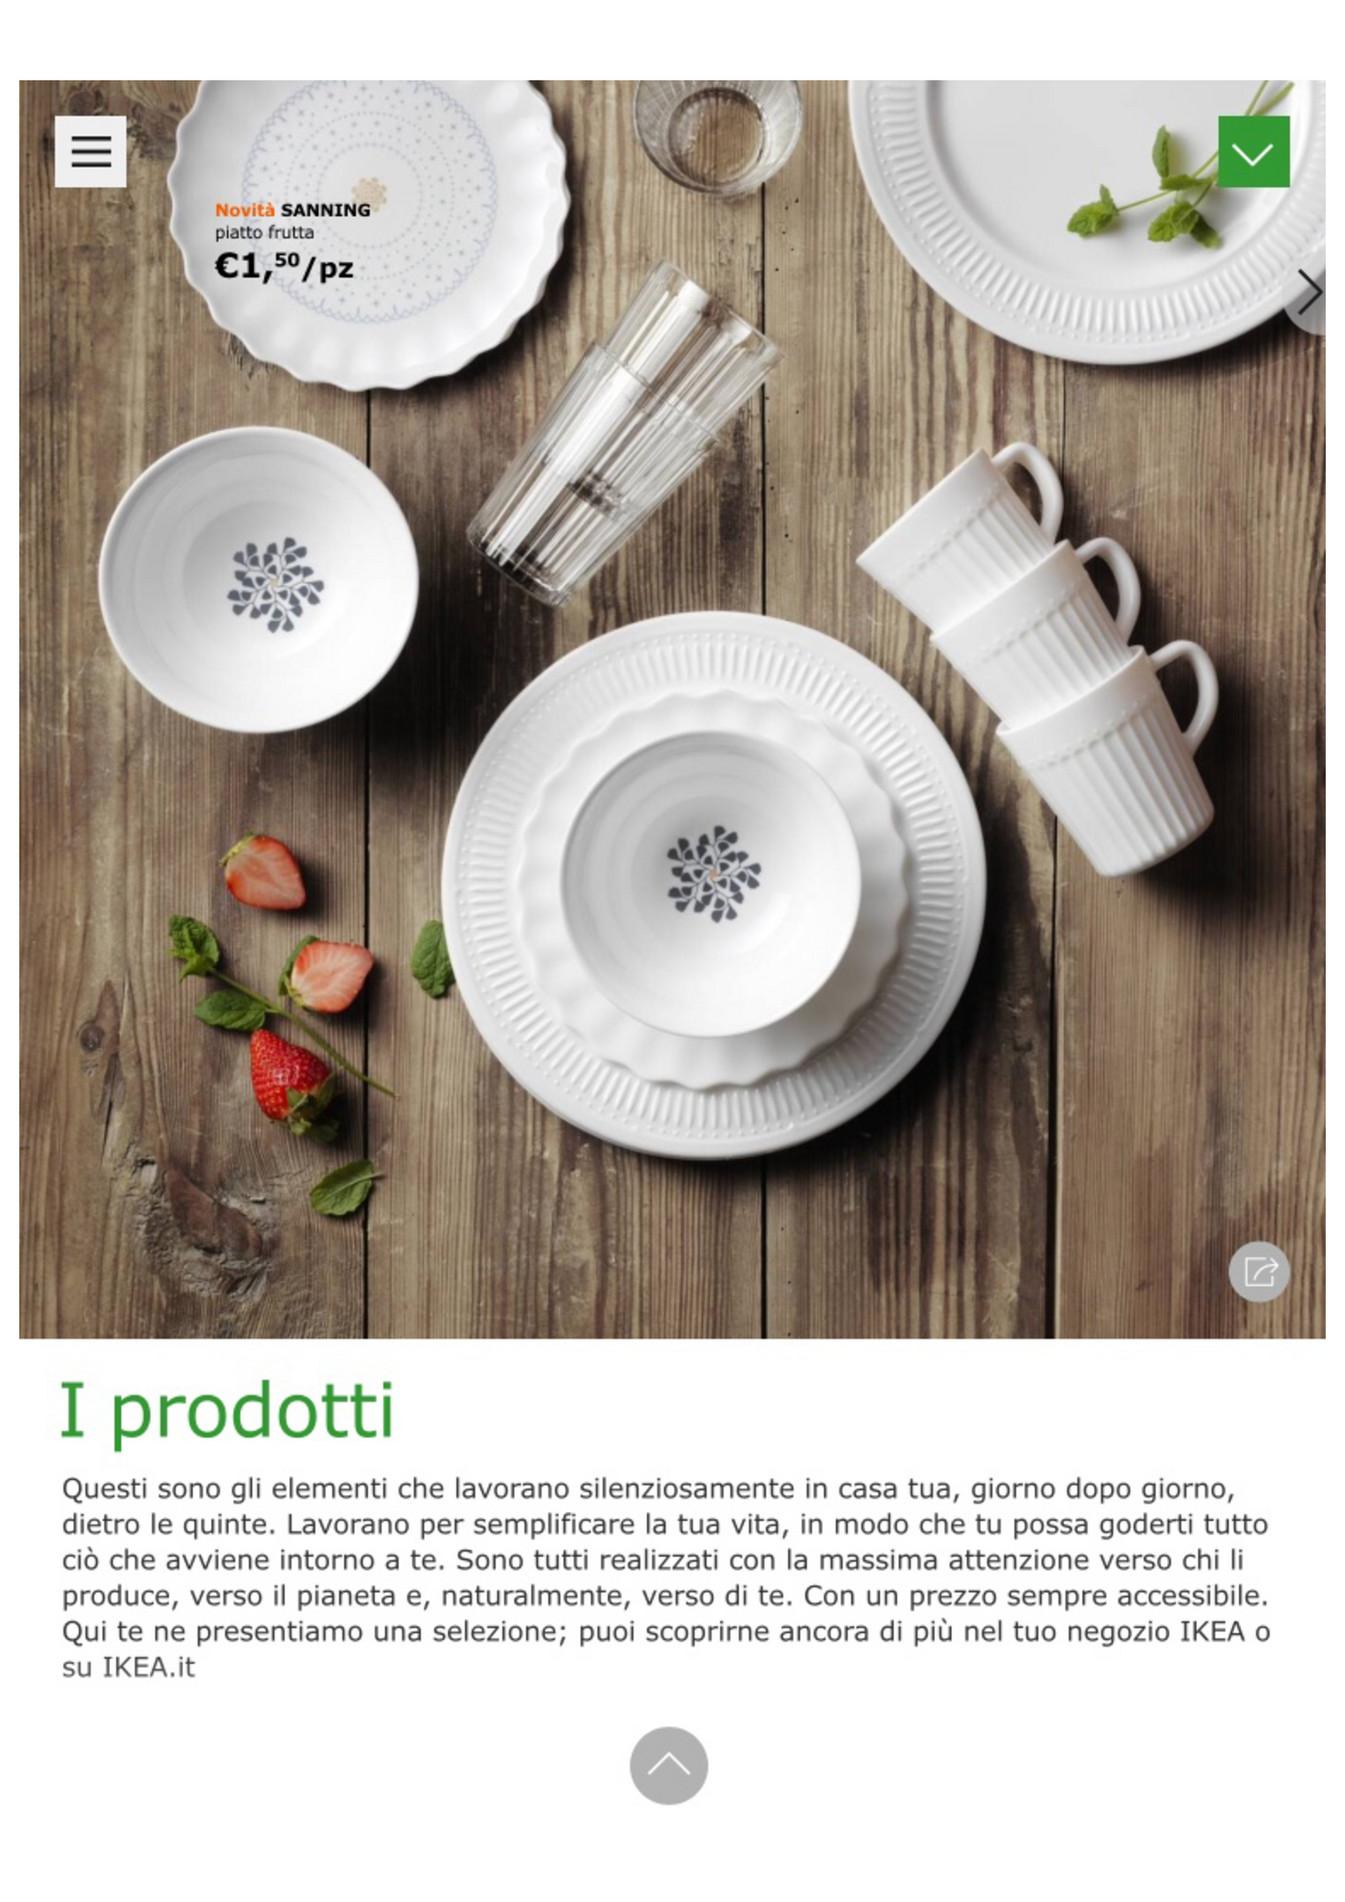 VolantinoFacile Catalogo Ikea 2017 Pagina 24 25 #2: 85ab10d befec0a657db93cb06c1d340a110 at1600